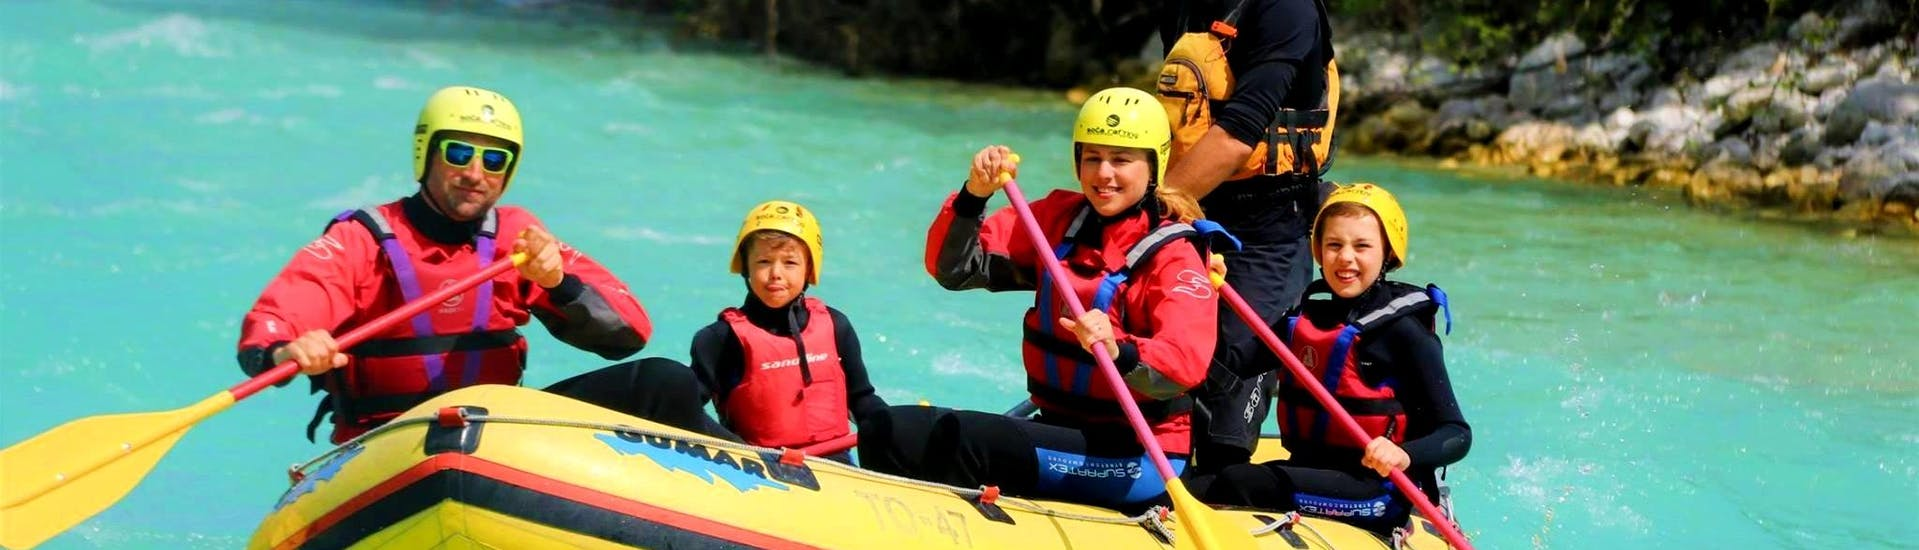 Rafting on the Soča River for Families - Kreda